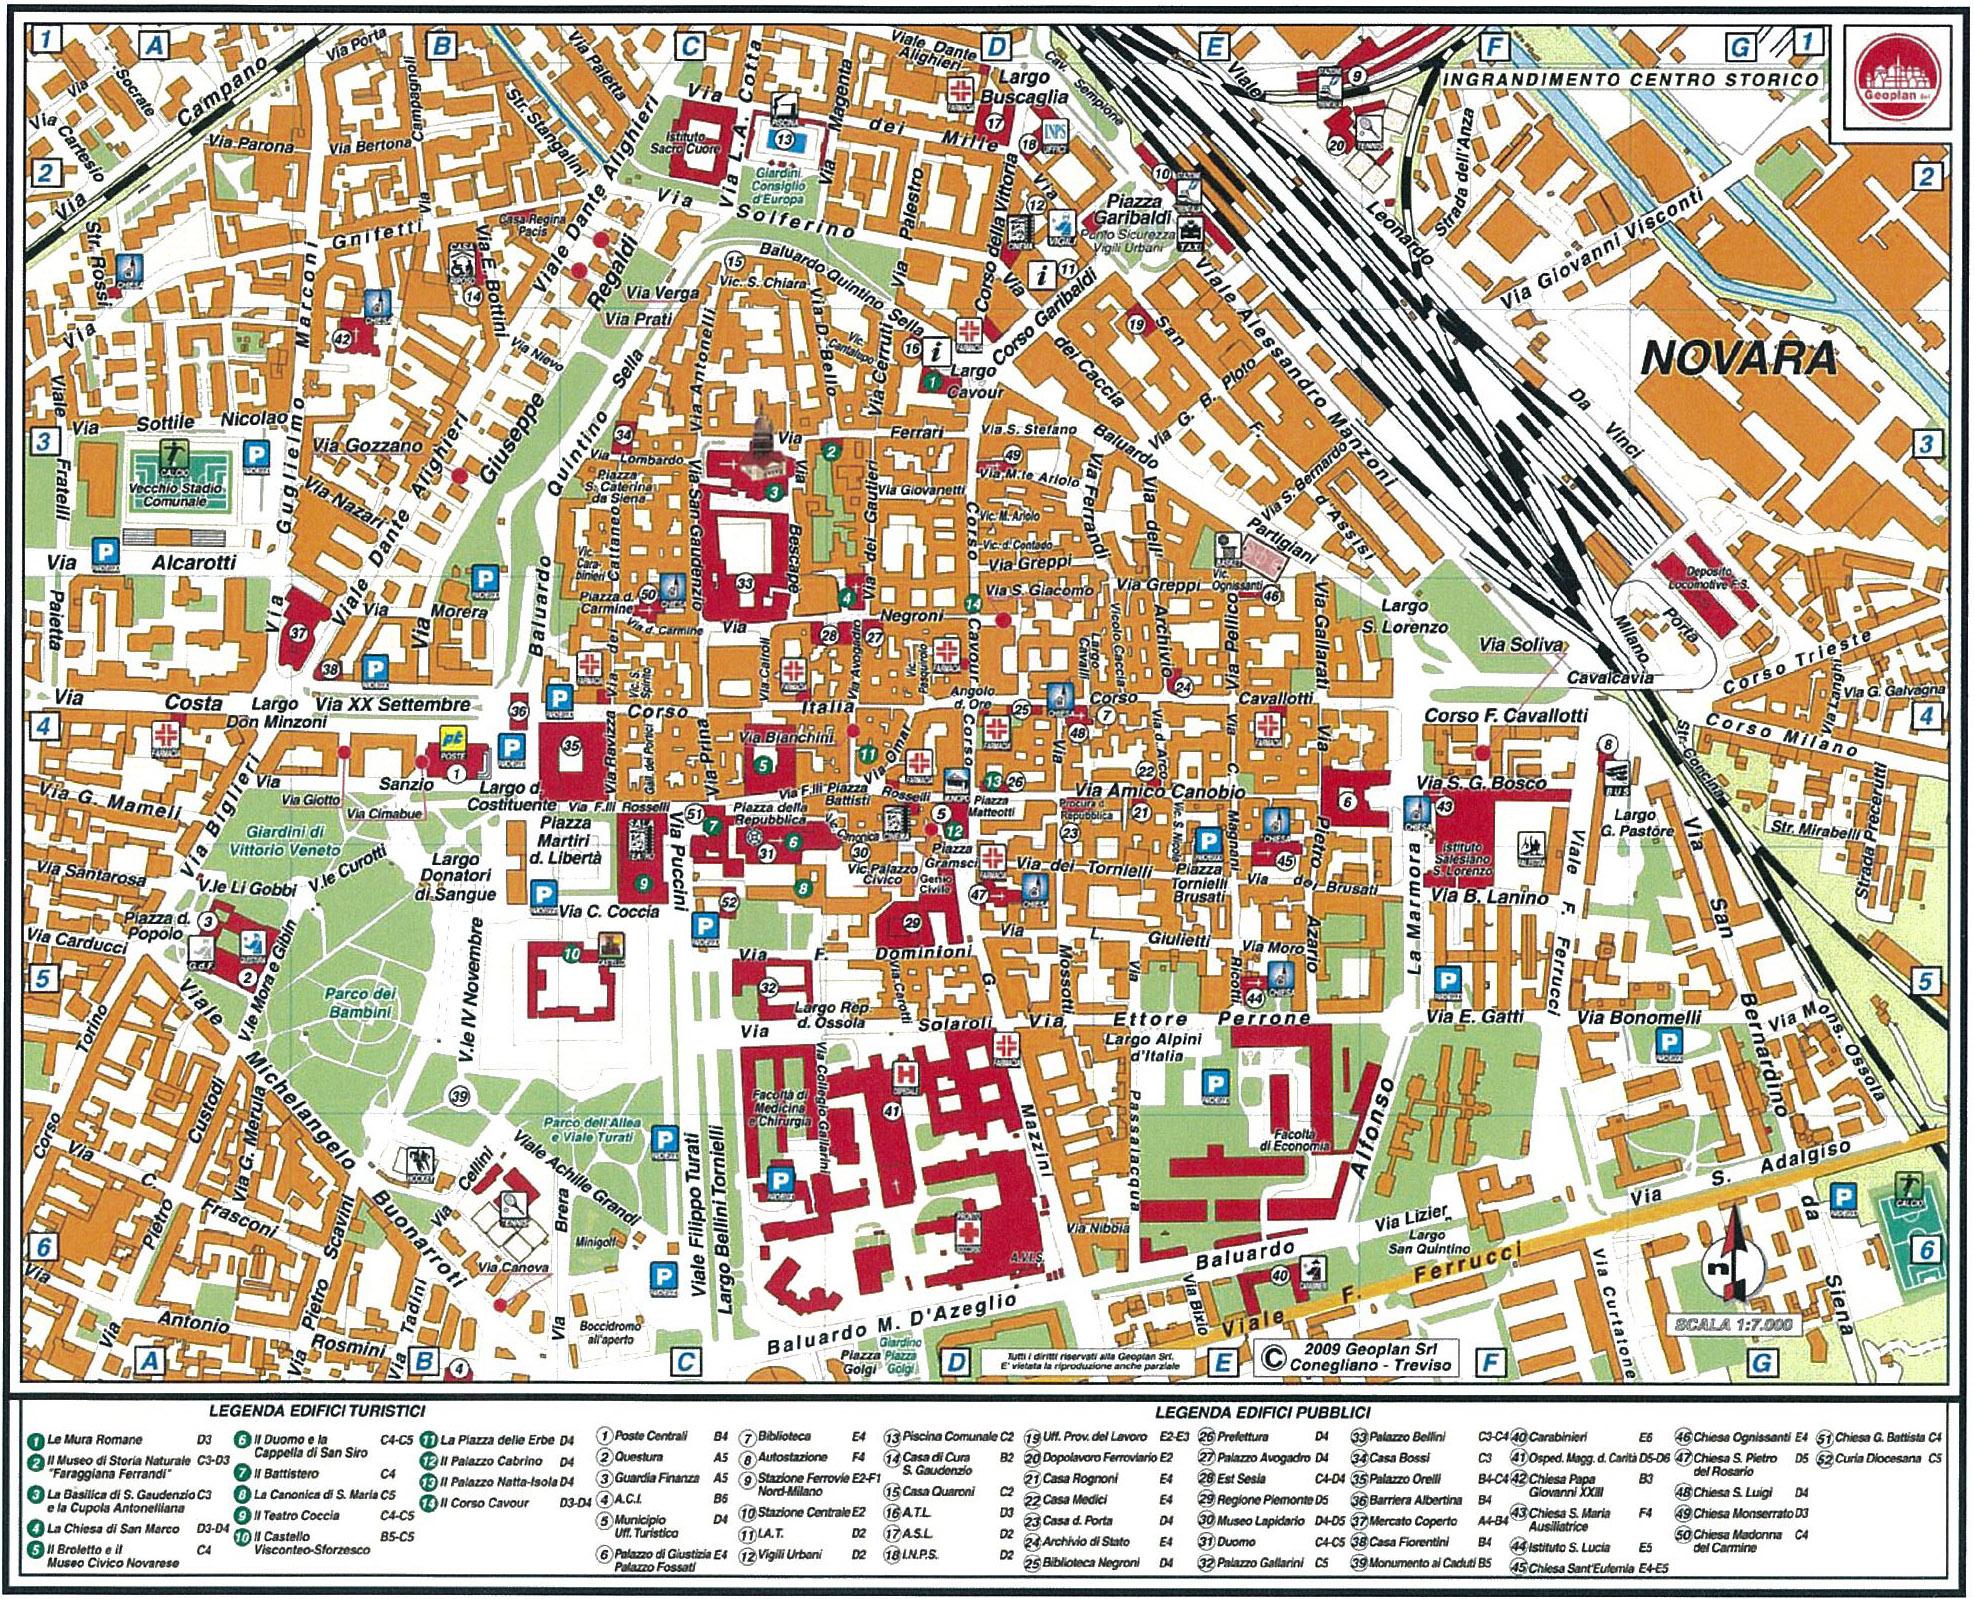 Novara Map italy Novara mappery